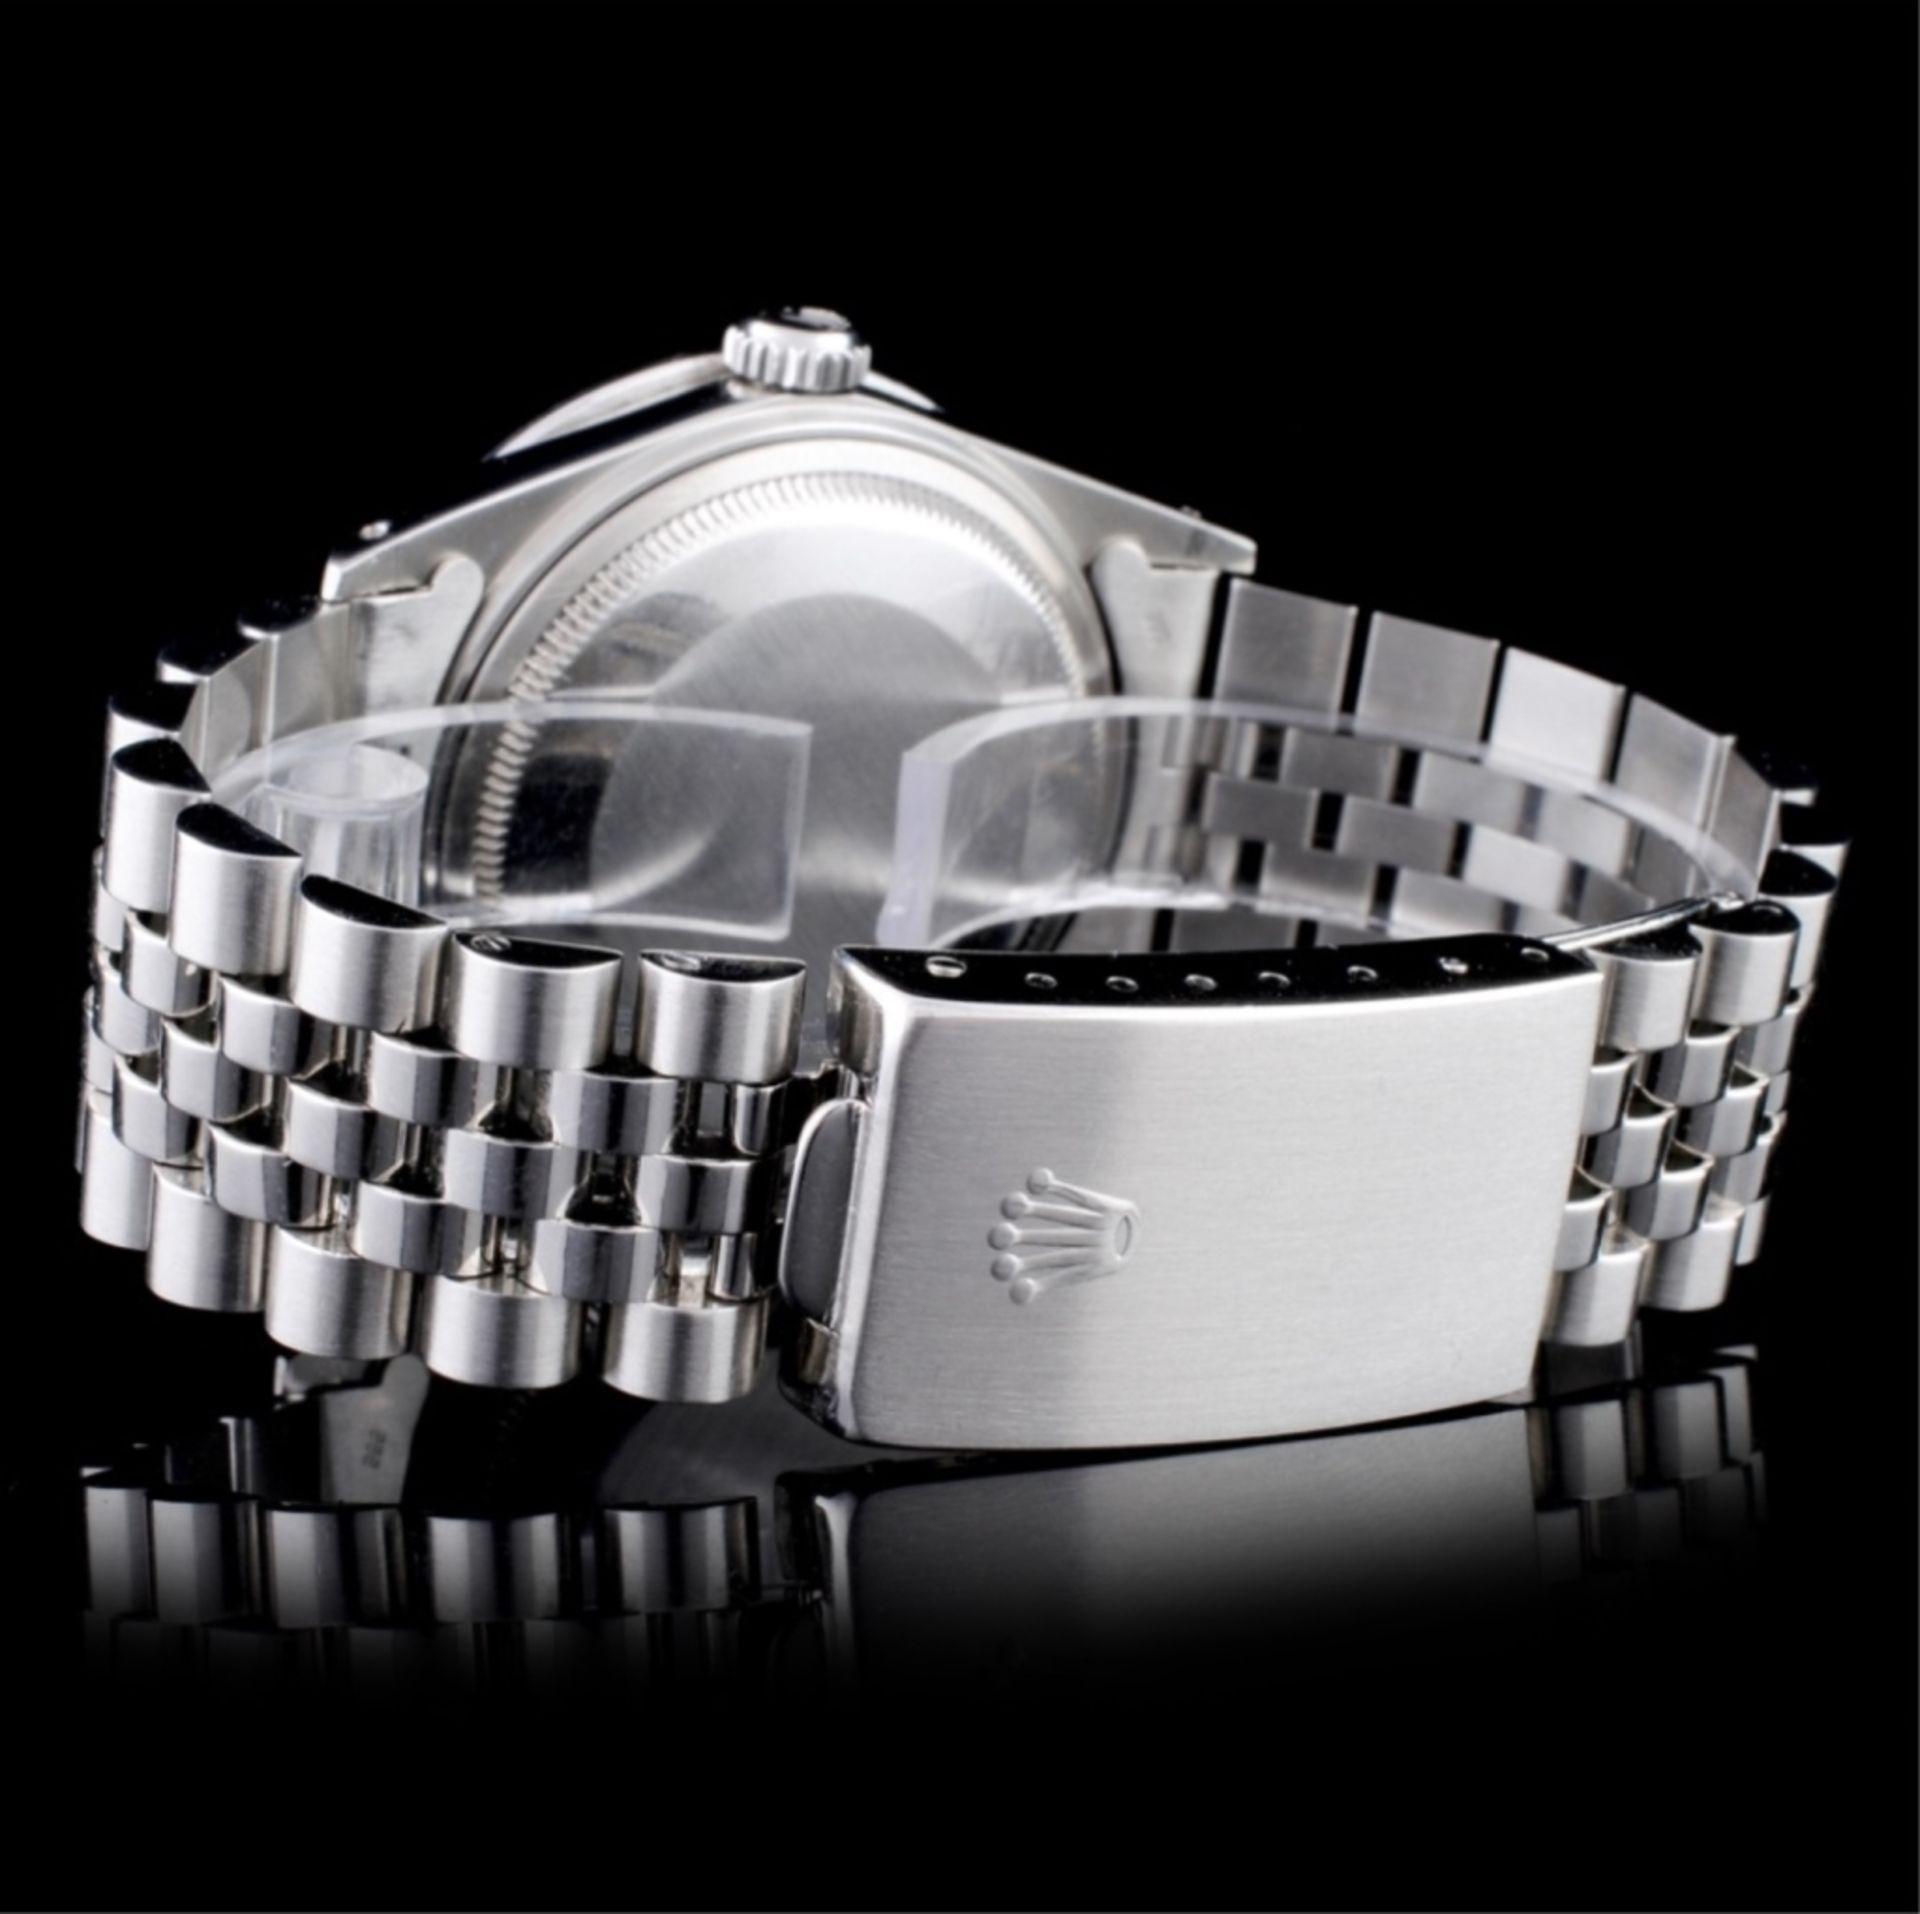 Rolex DateJust Diamond 36MM Wristwatch - Image 3 of 5